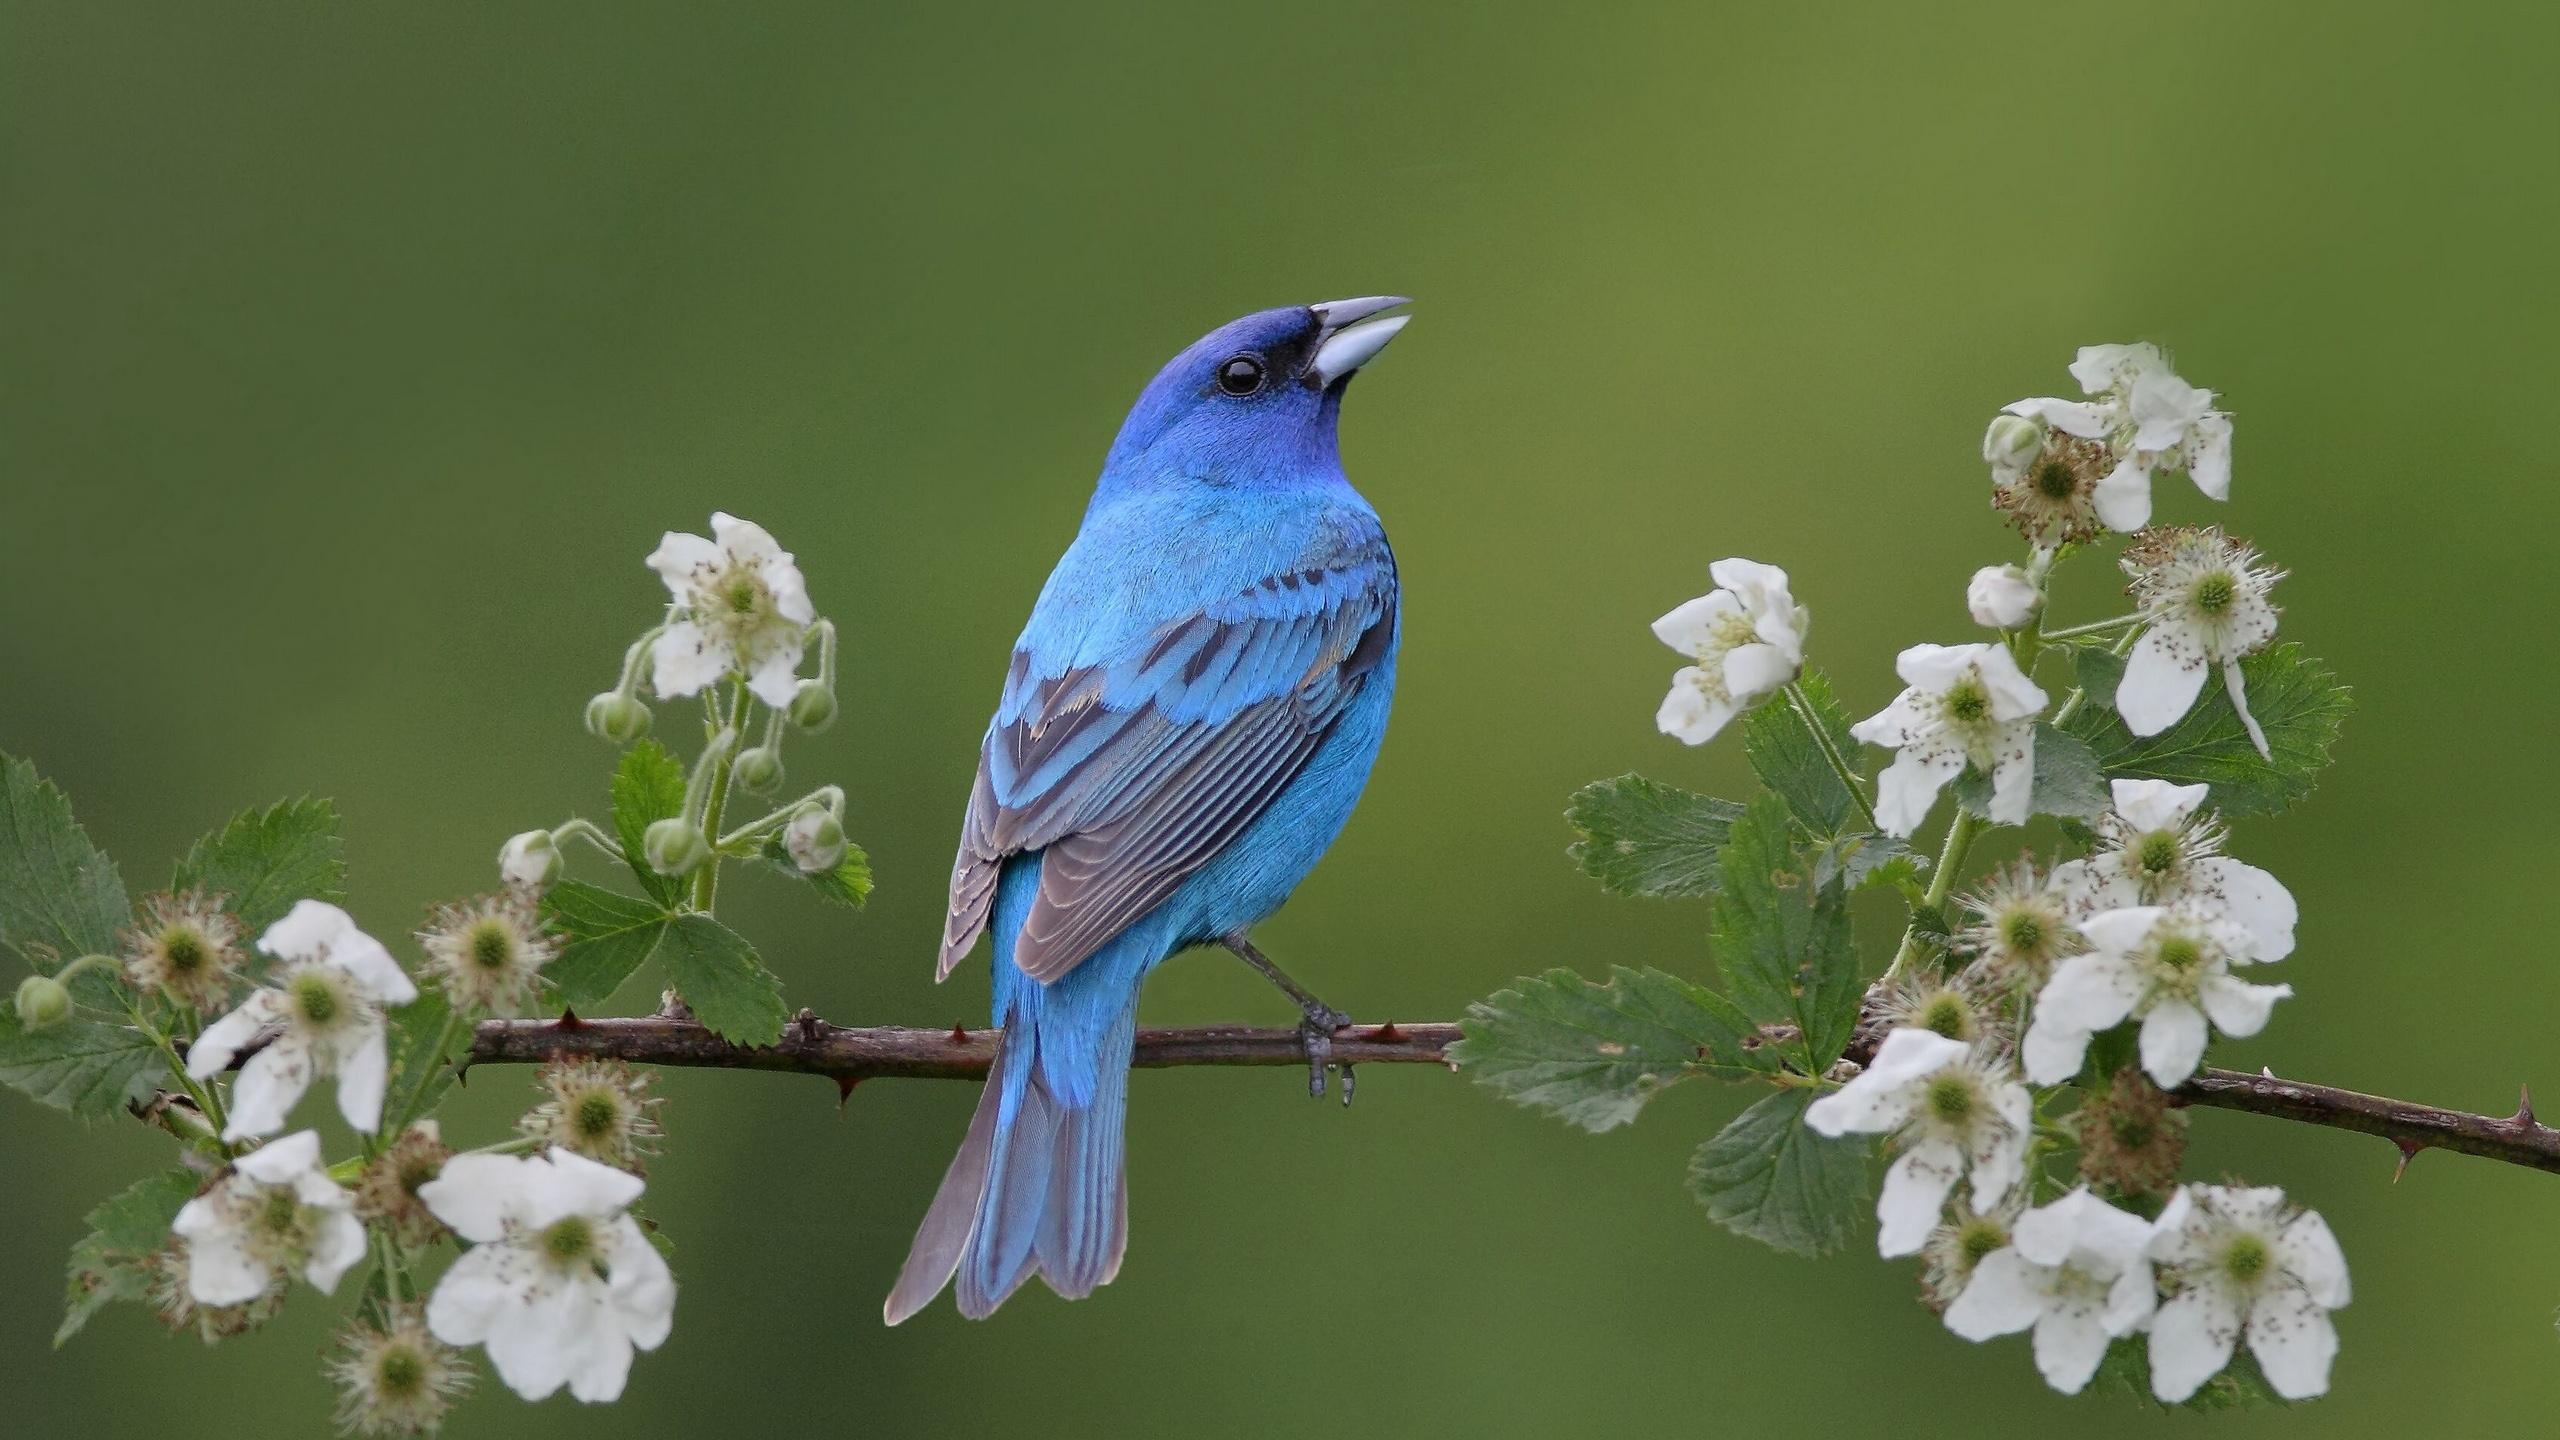 Fonds D Ecran Oiseau Bleu Au Printemps 2560x1600 Hd Image